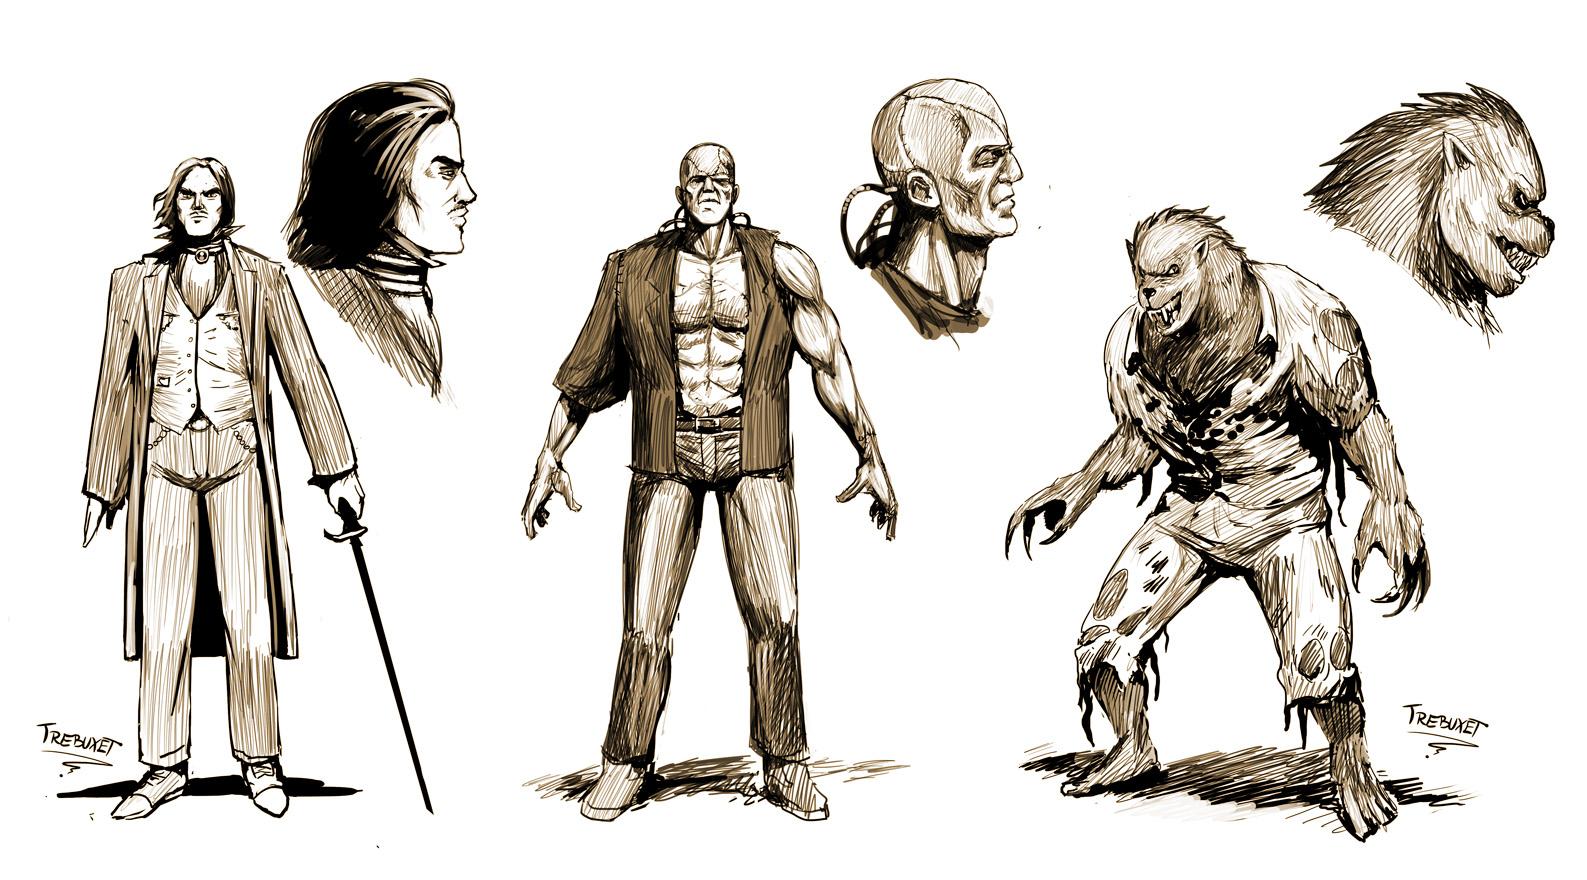 Horror Game Concept Art 1